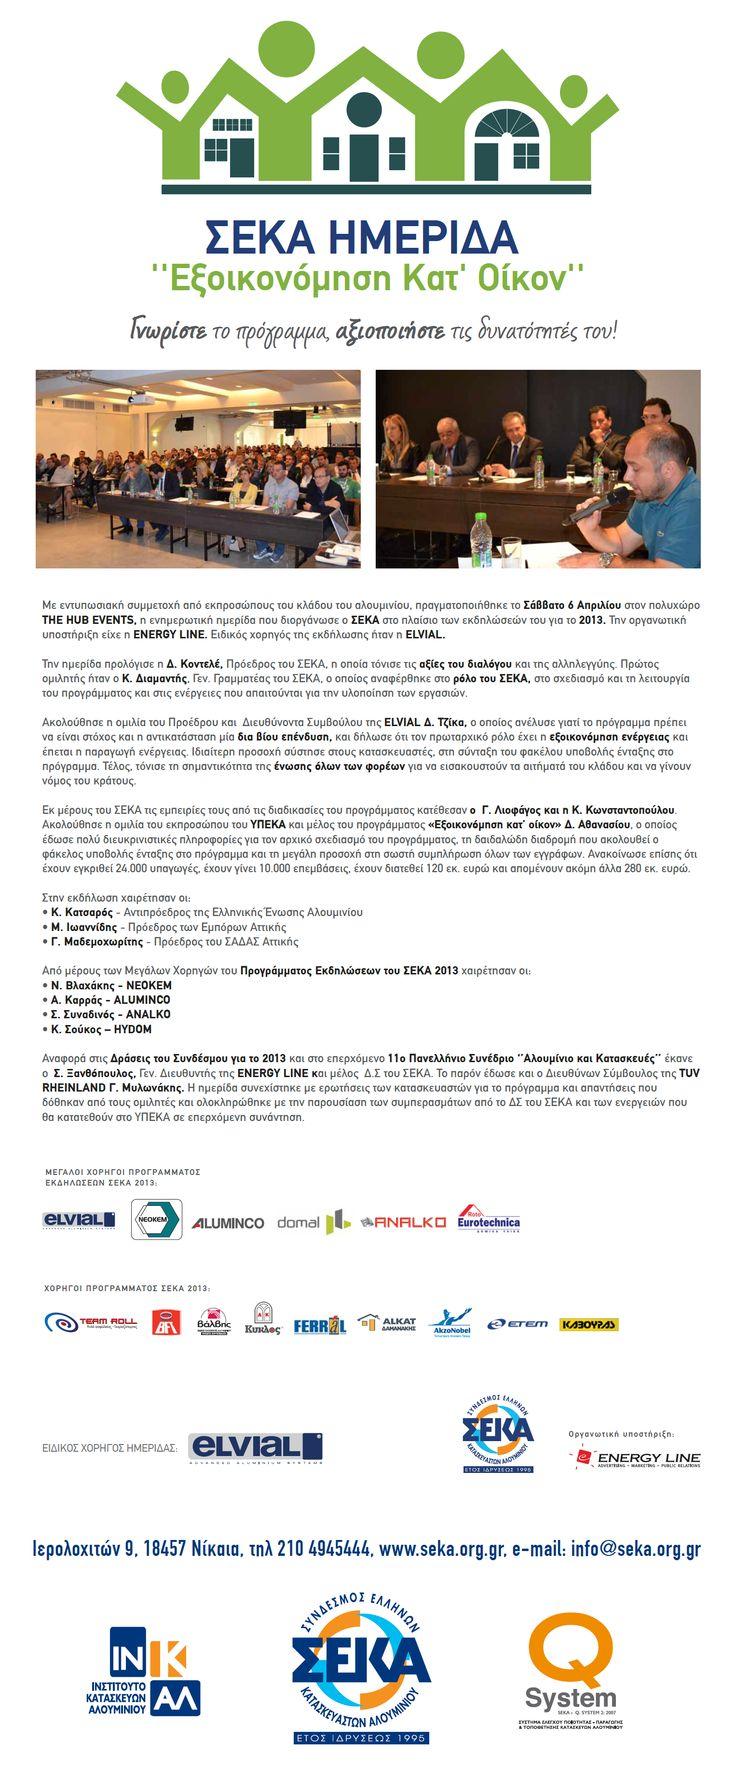 GREEK ALUMINIUM CONSTRUCTORS ASSOSIATION  - Workshop on Energy saving, organization - Creation of event identity  - Development of sponsorship programs  - Development of communication and publicity  - Creation of communication material